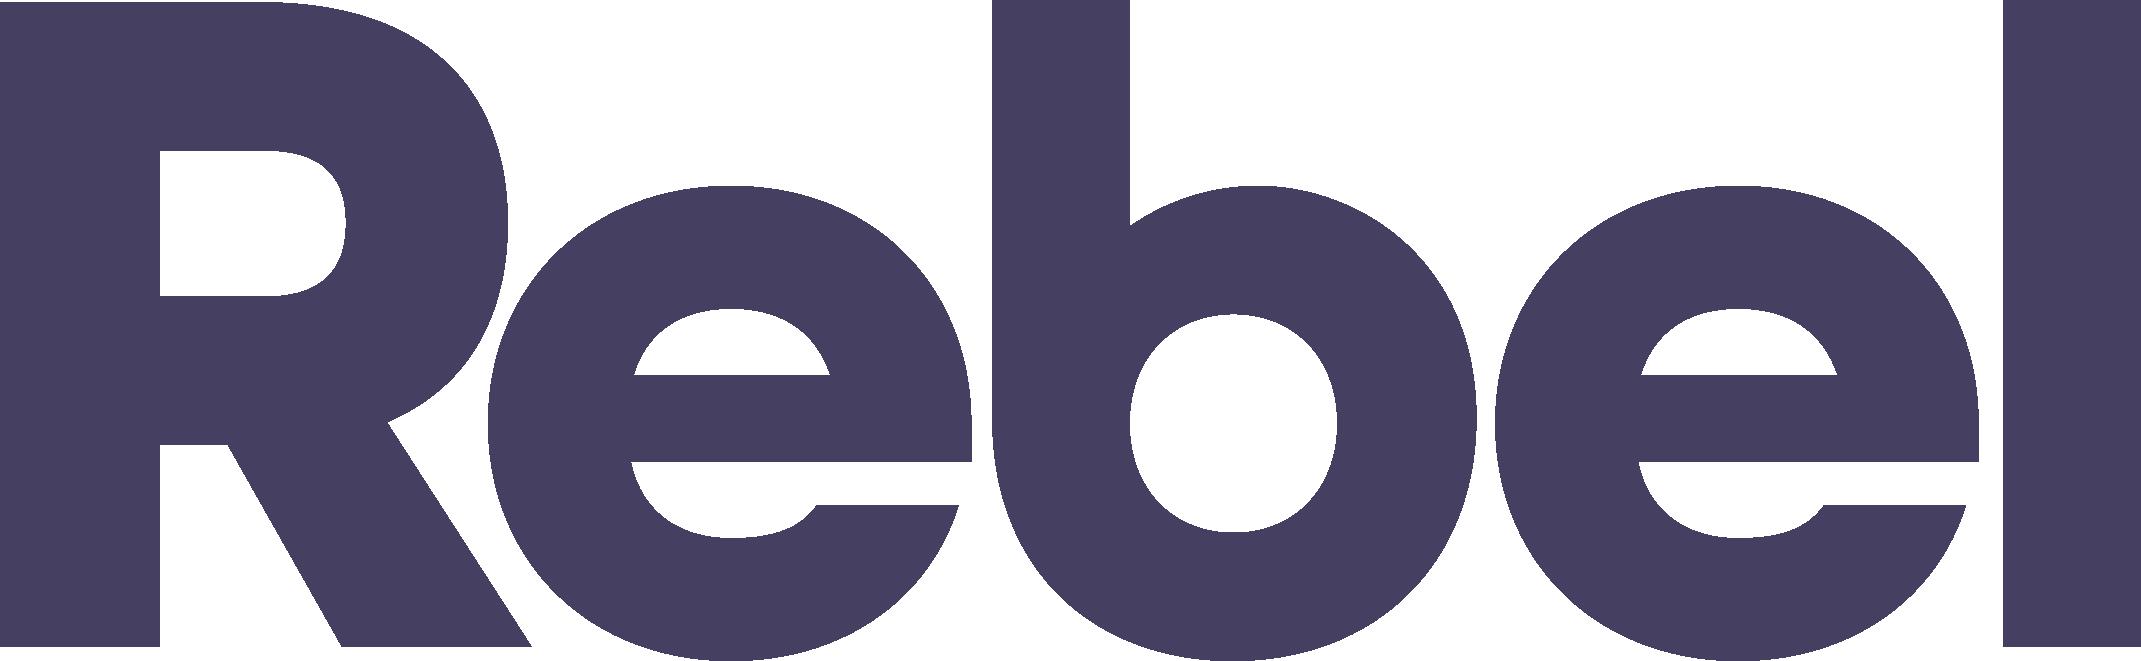 Rebel.com Blog